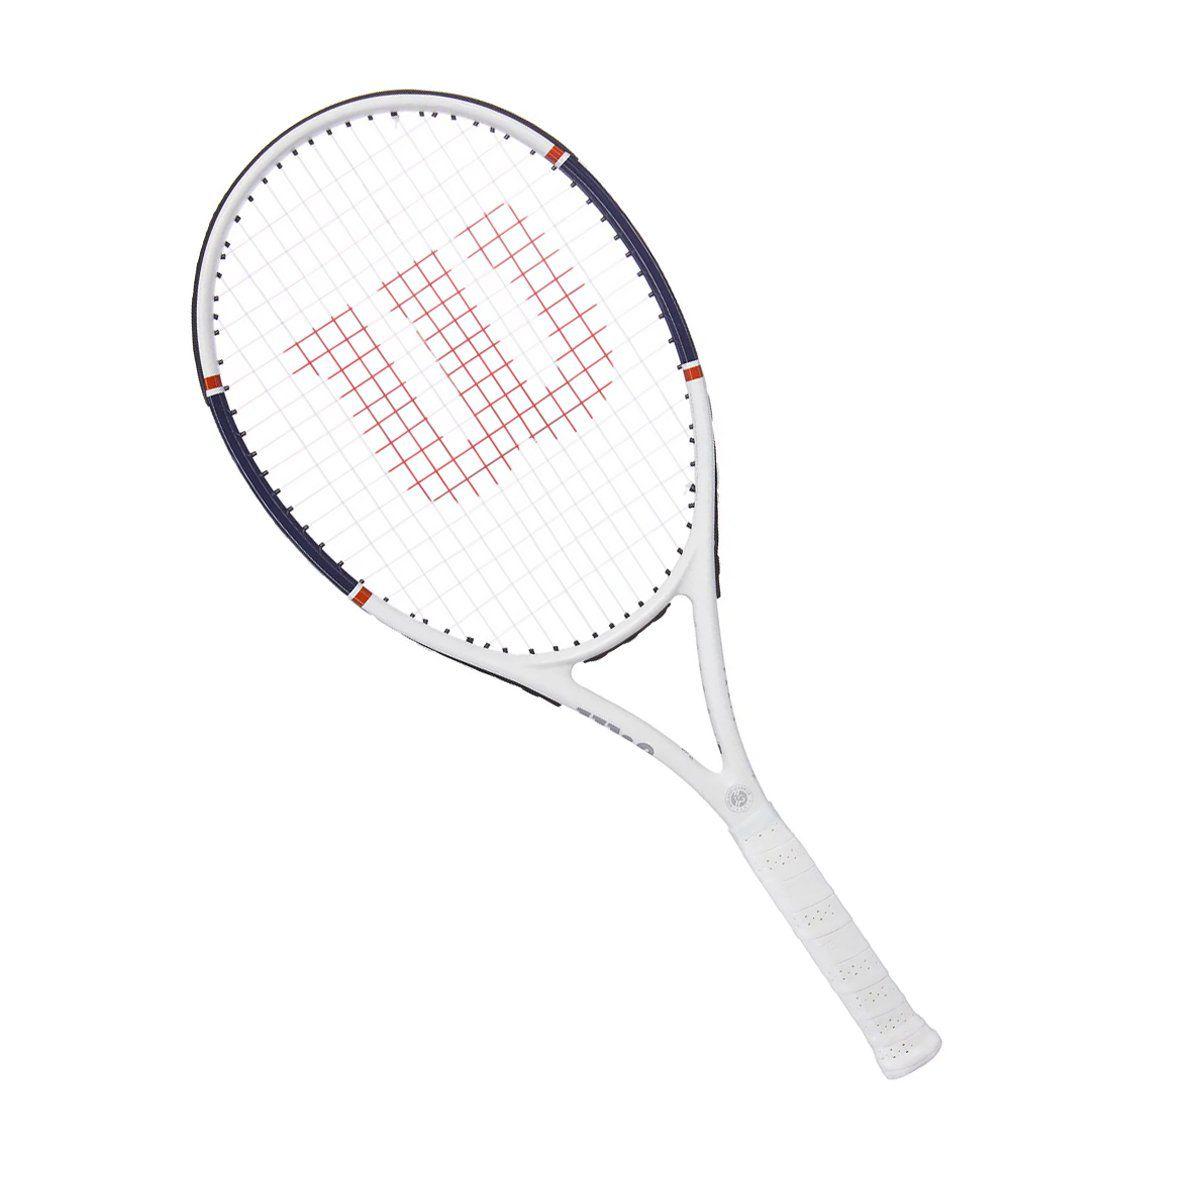 Raquete de Tênis Wilson Roland Garros Triumph (FRETE GRATIS)